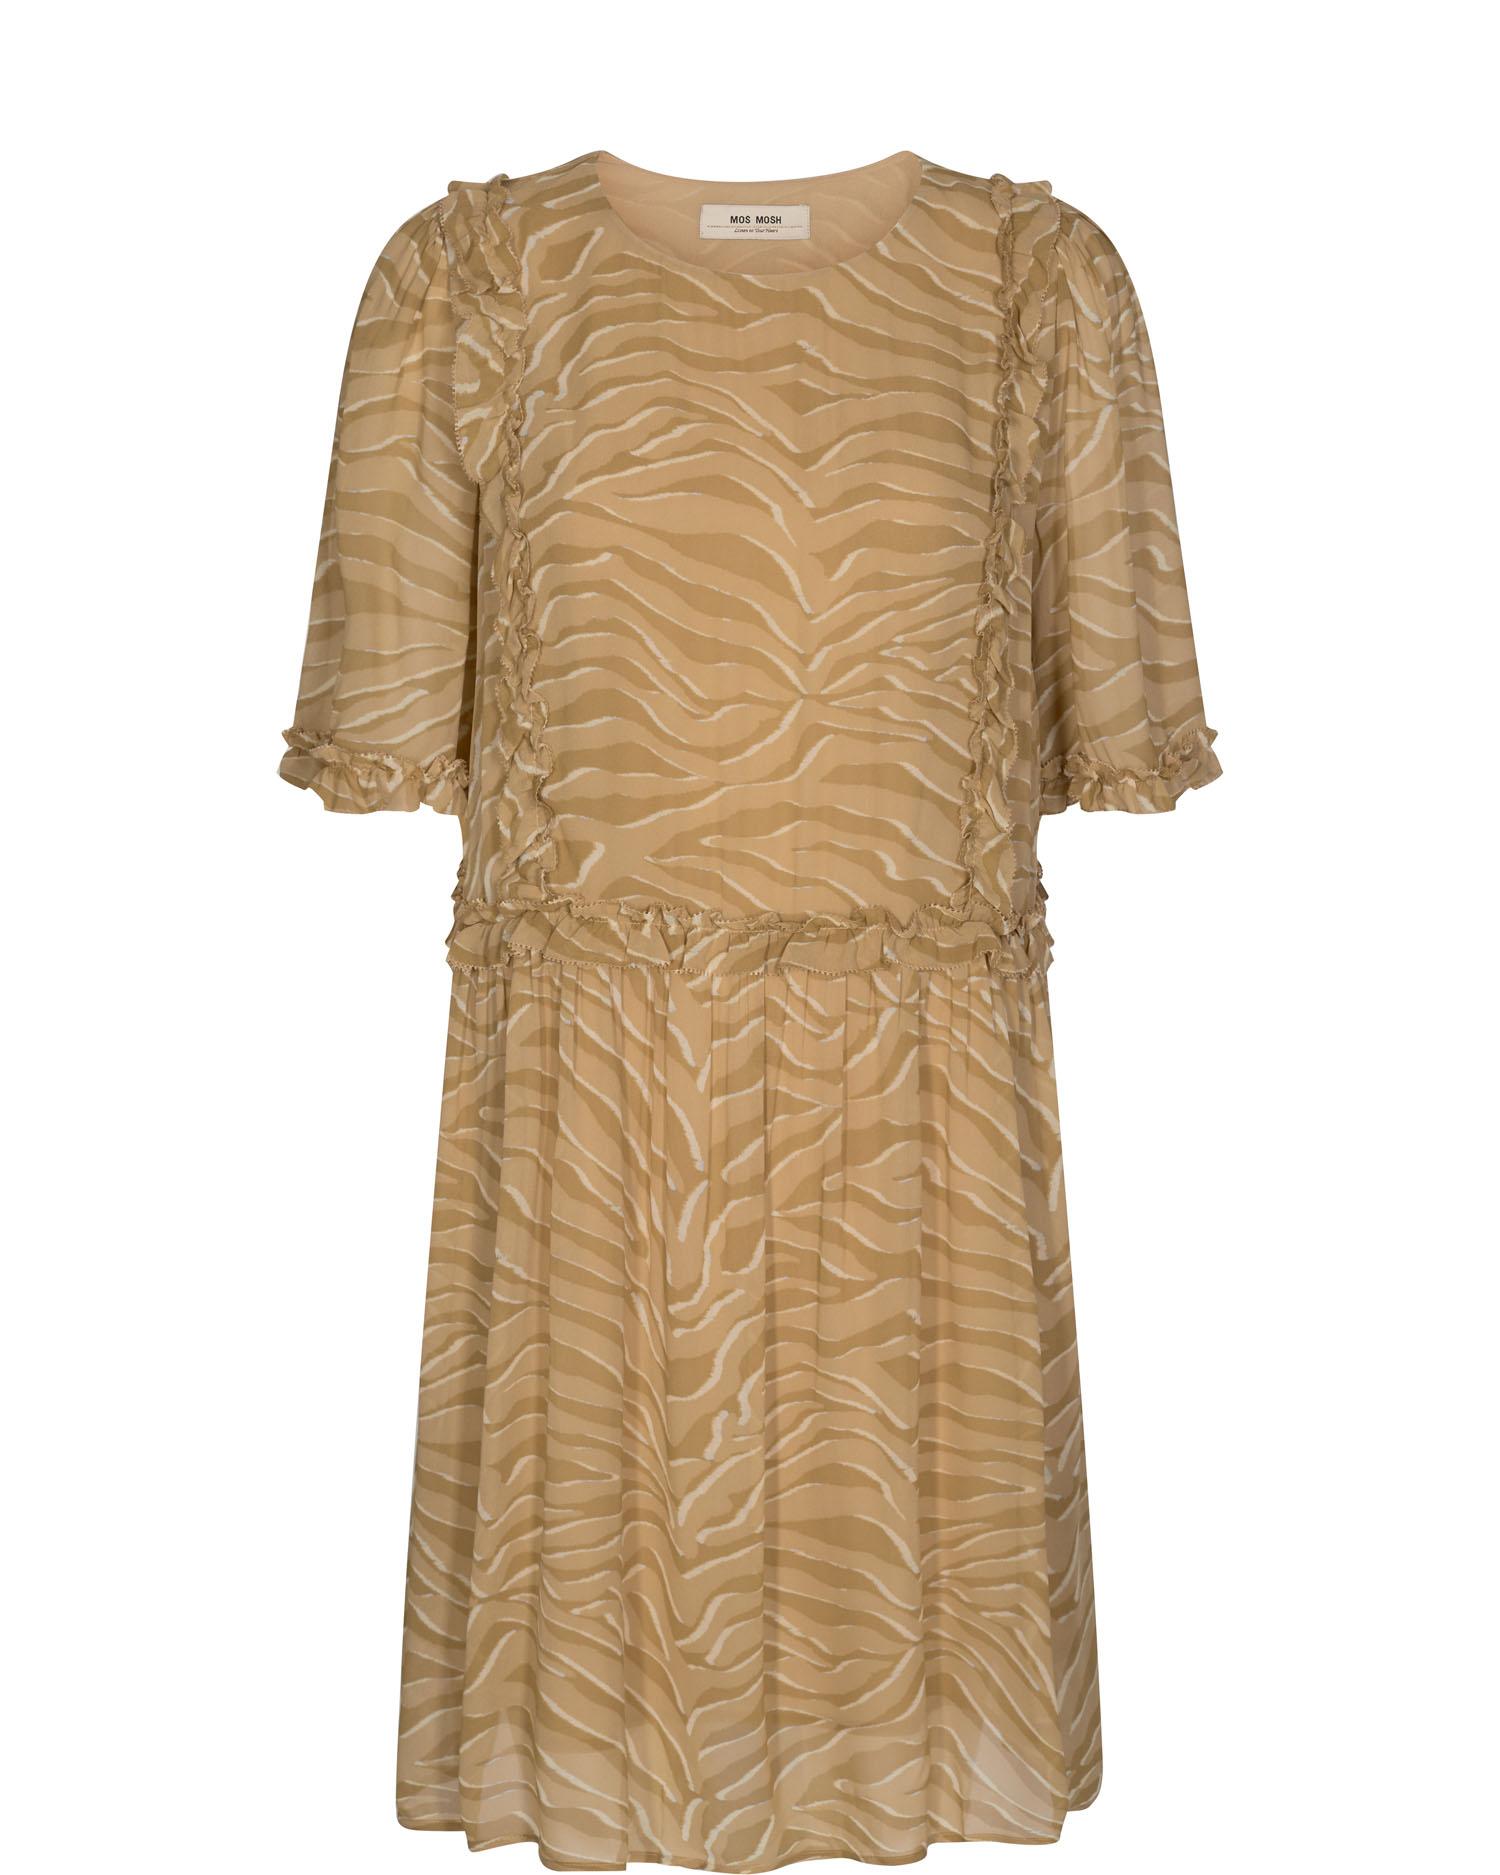 Malise Zebra Dress